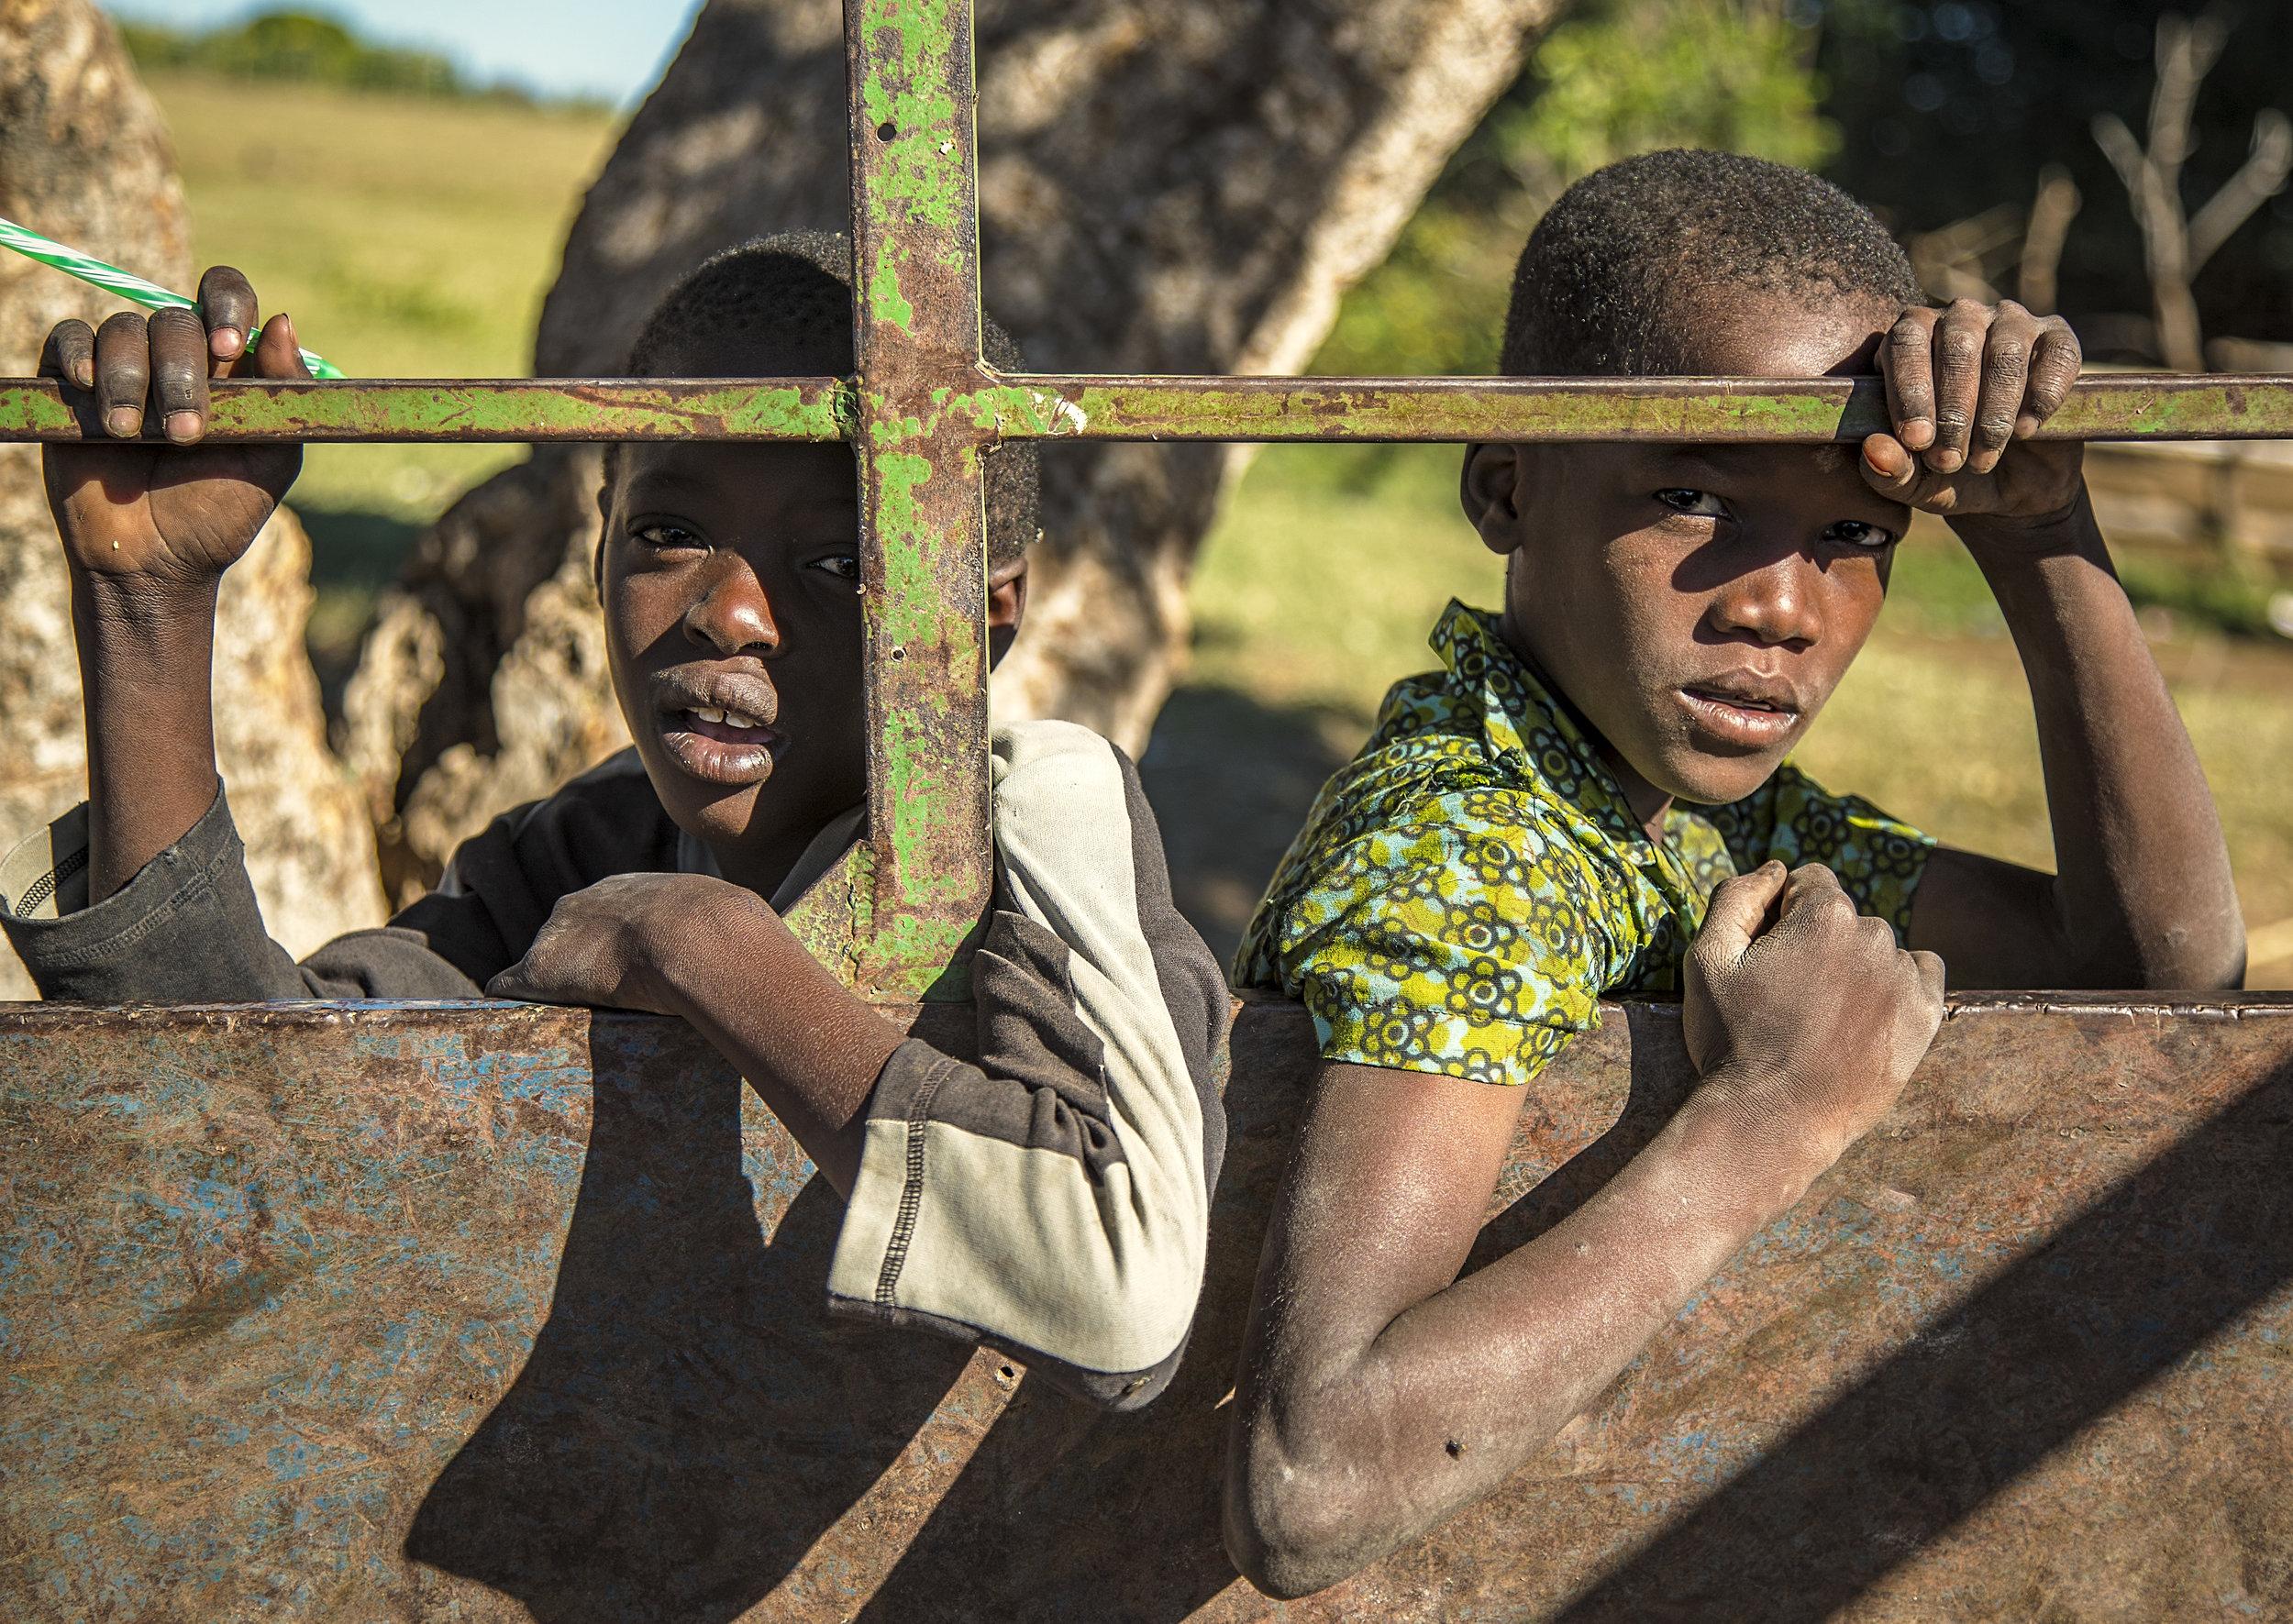 Simon+Needham+Photography+Tanzania+4.jpg